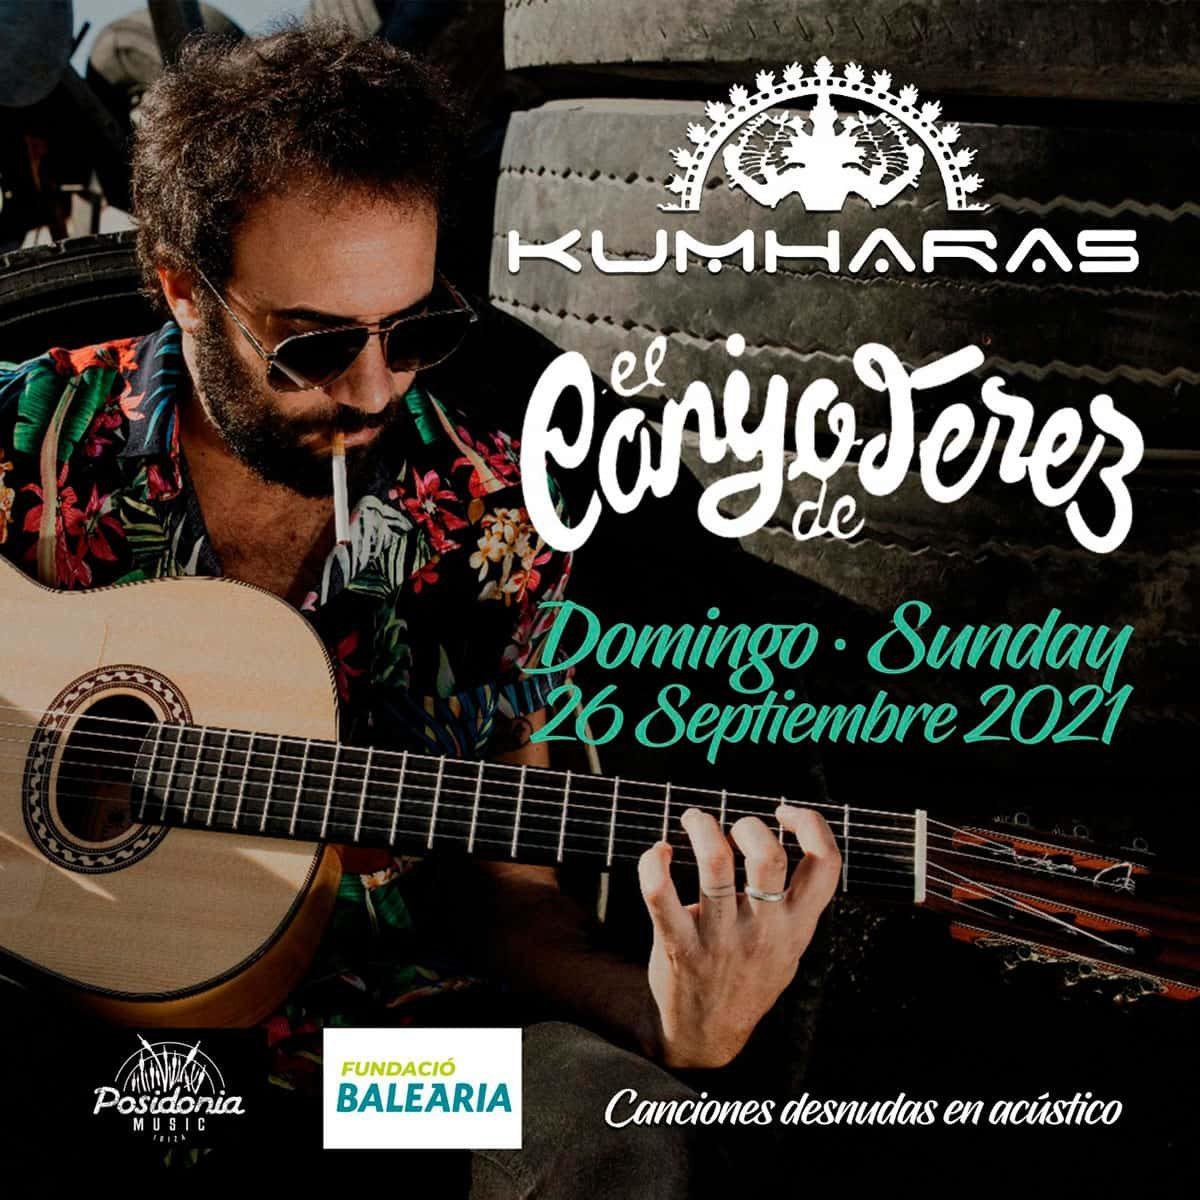 concert-el-canijo-de-jerez-kumharas-ibiza-2021-welcometoibiza